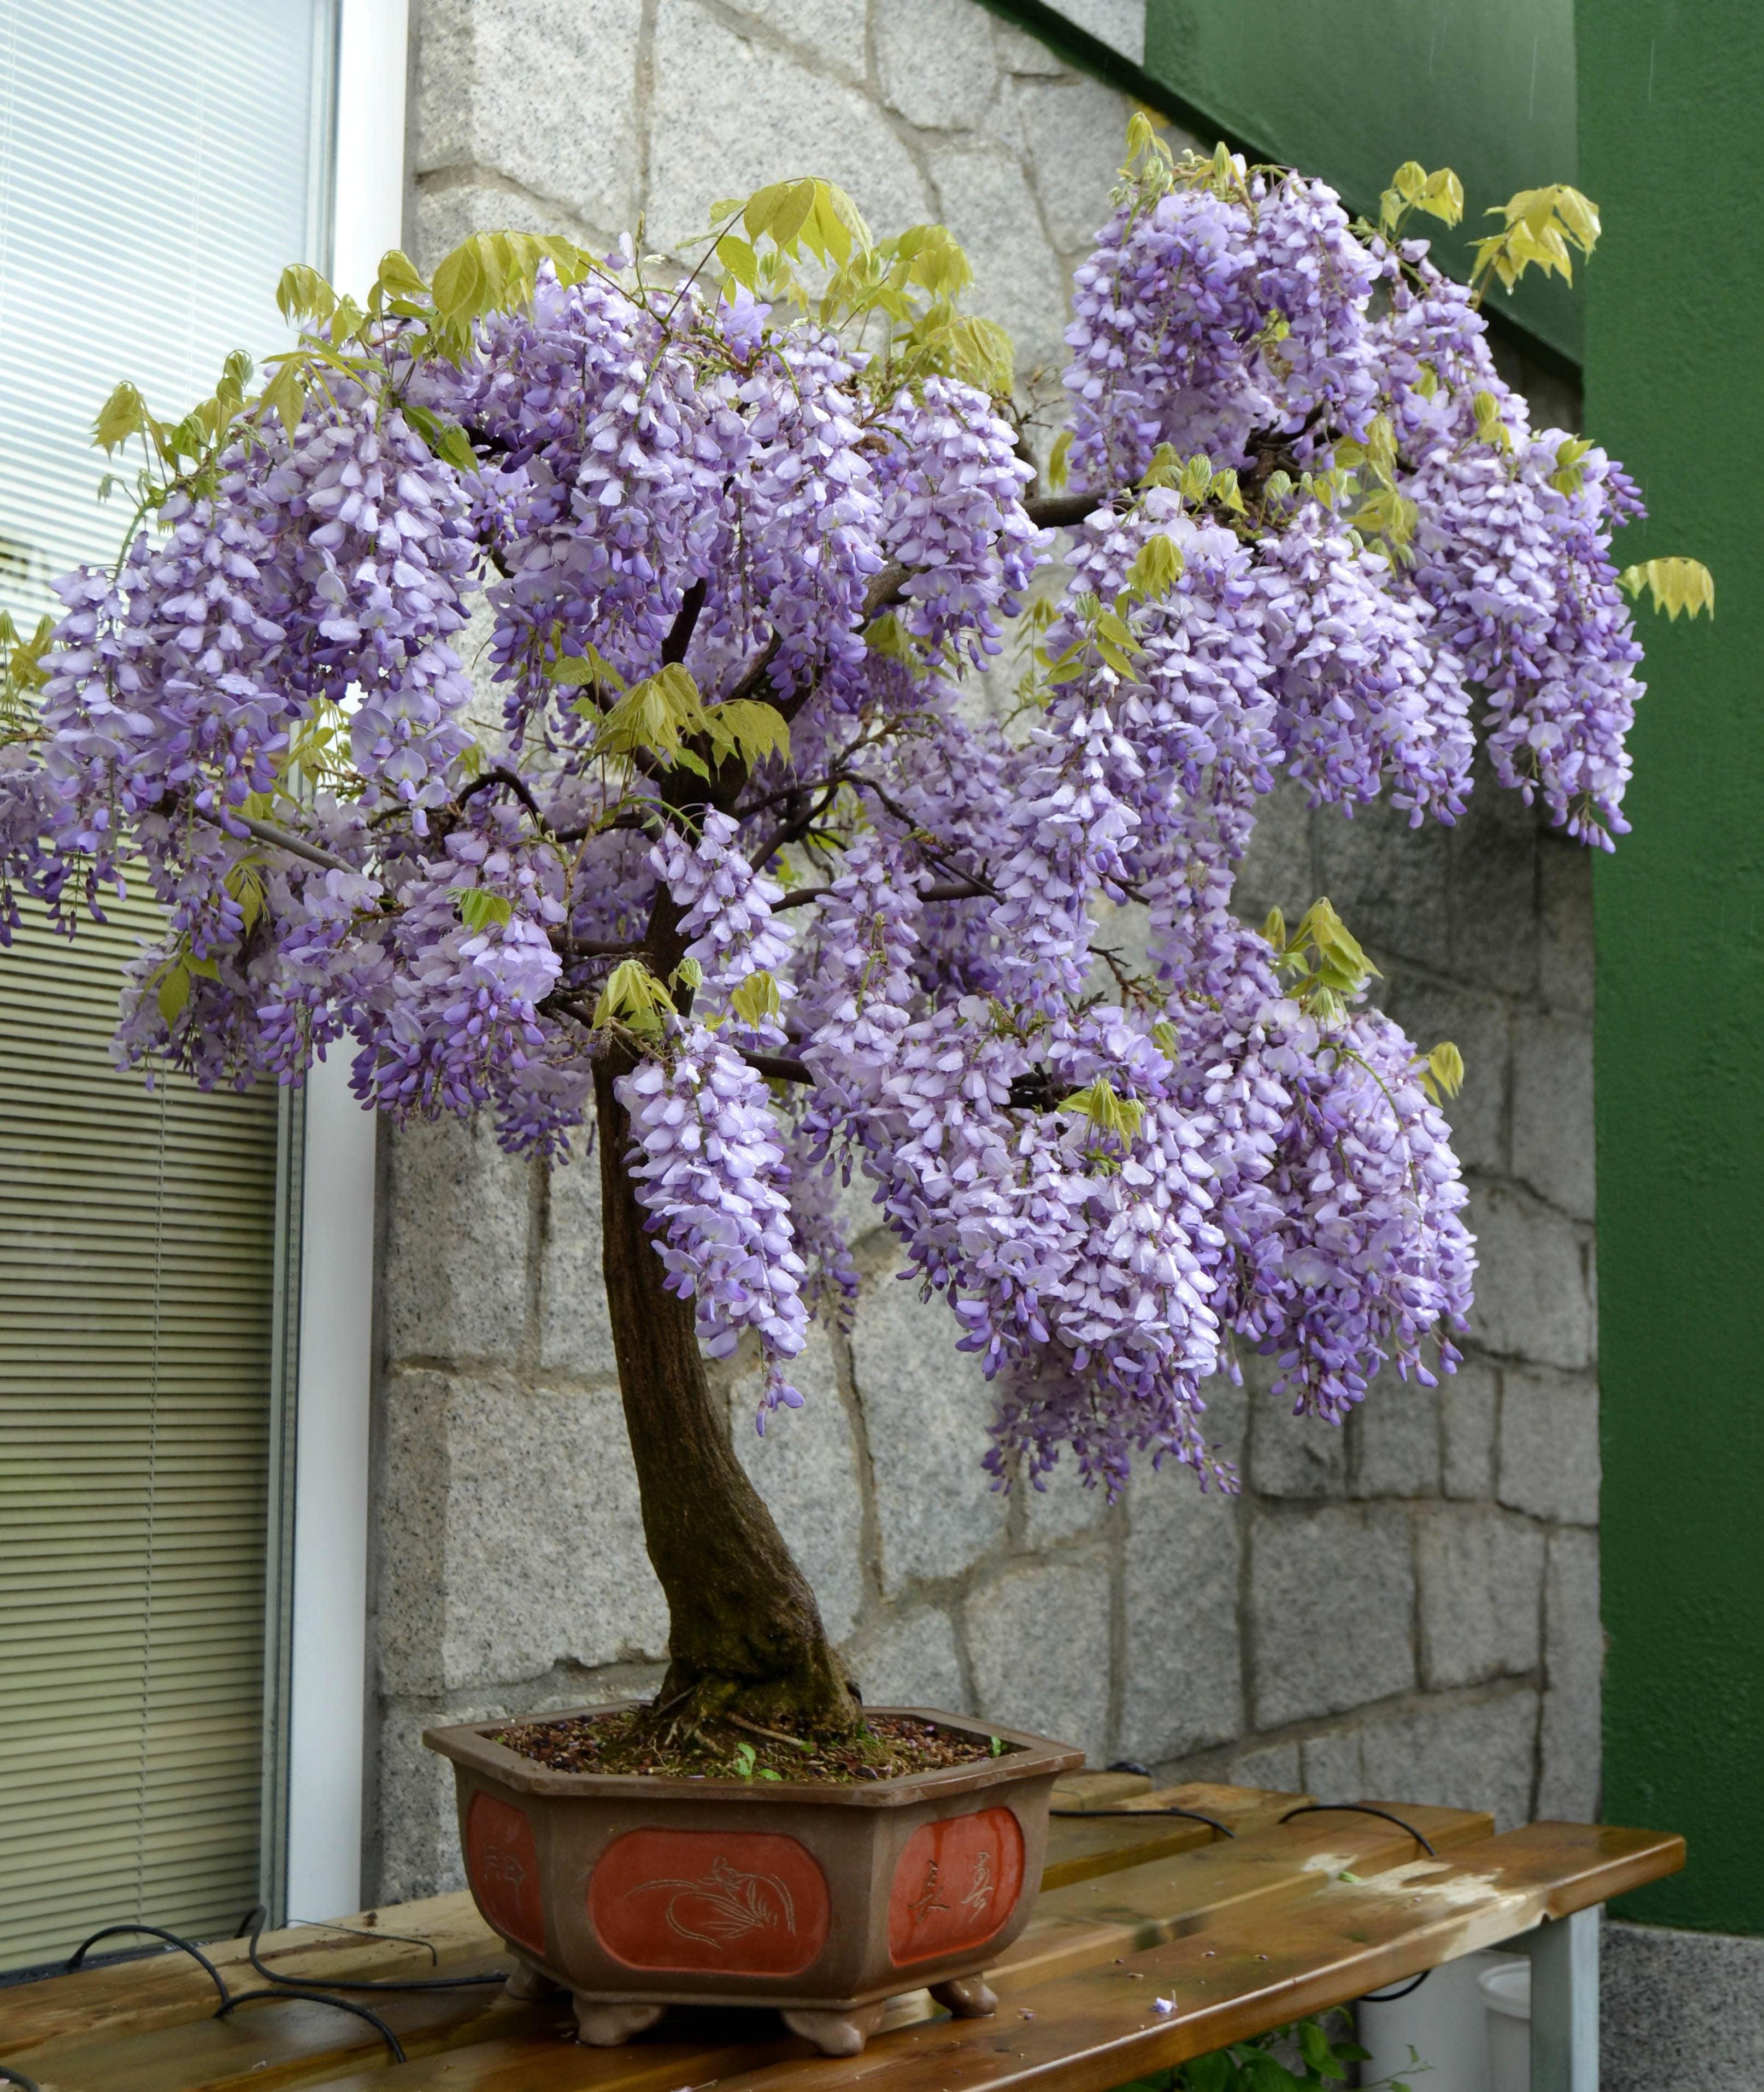 Wisteria cultivo como bons i blog bonsai colmenarblog bonsai colmenar - Glicinia en maceta ...